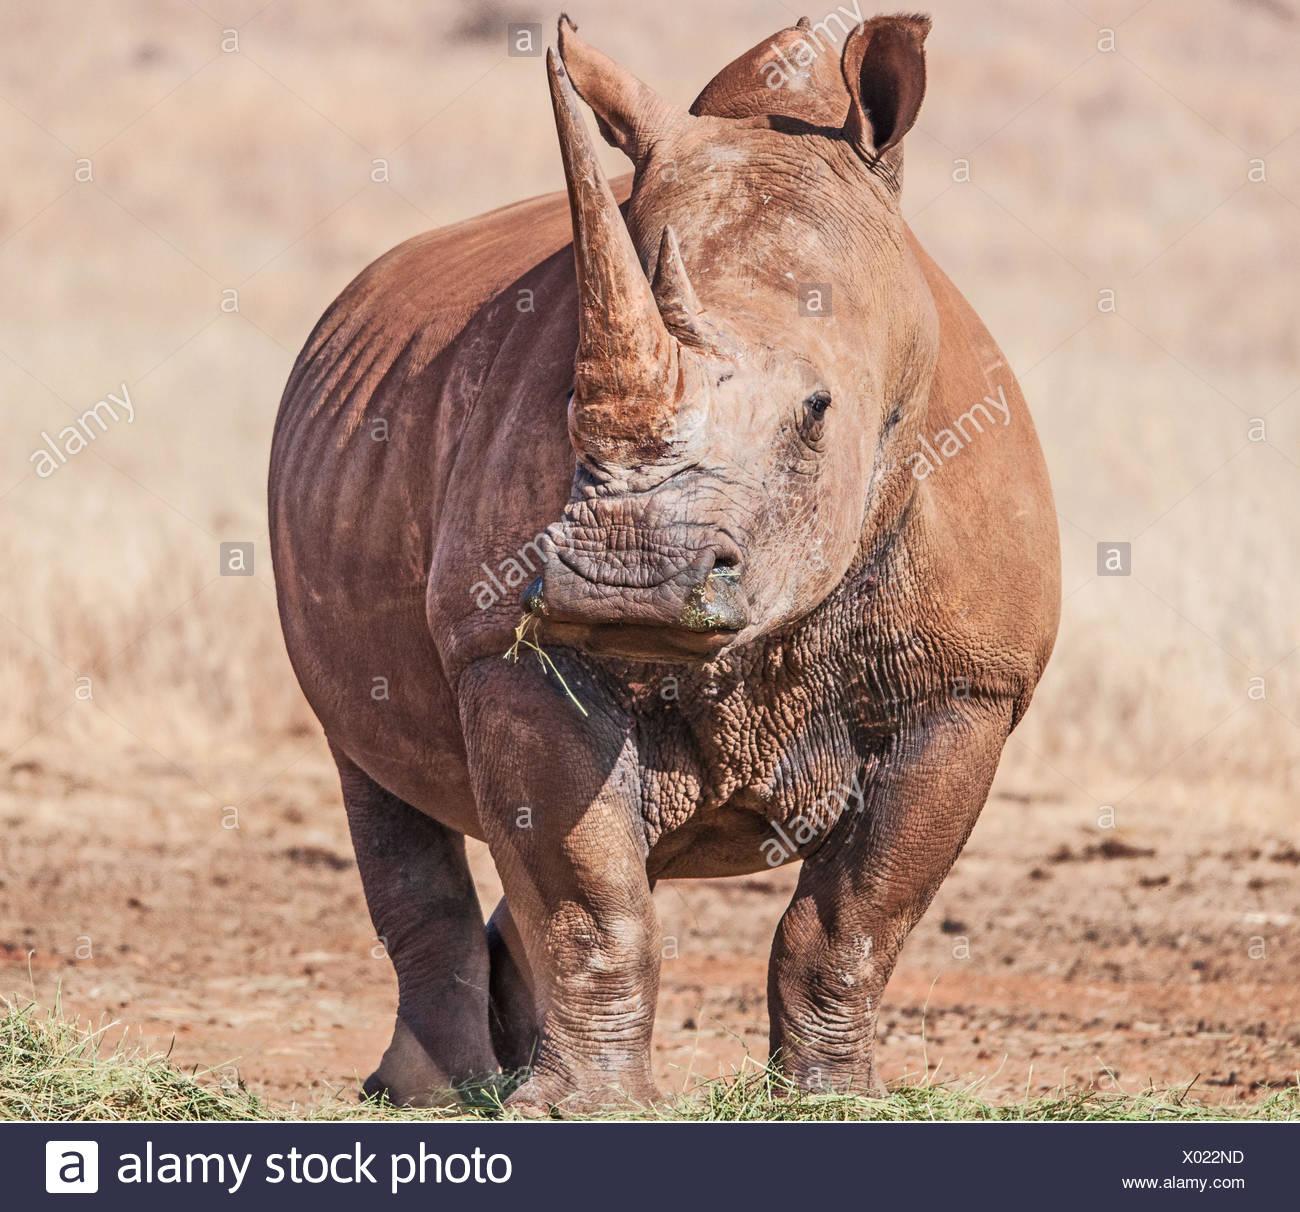 White Rhinoceros, South Africa - Stock Image